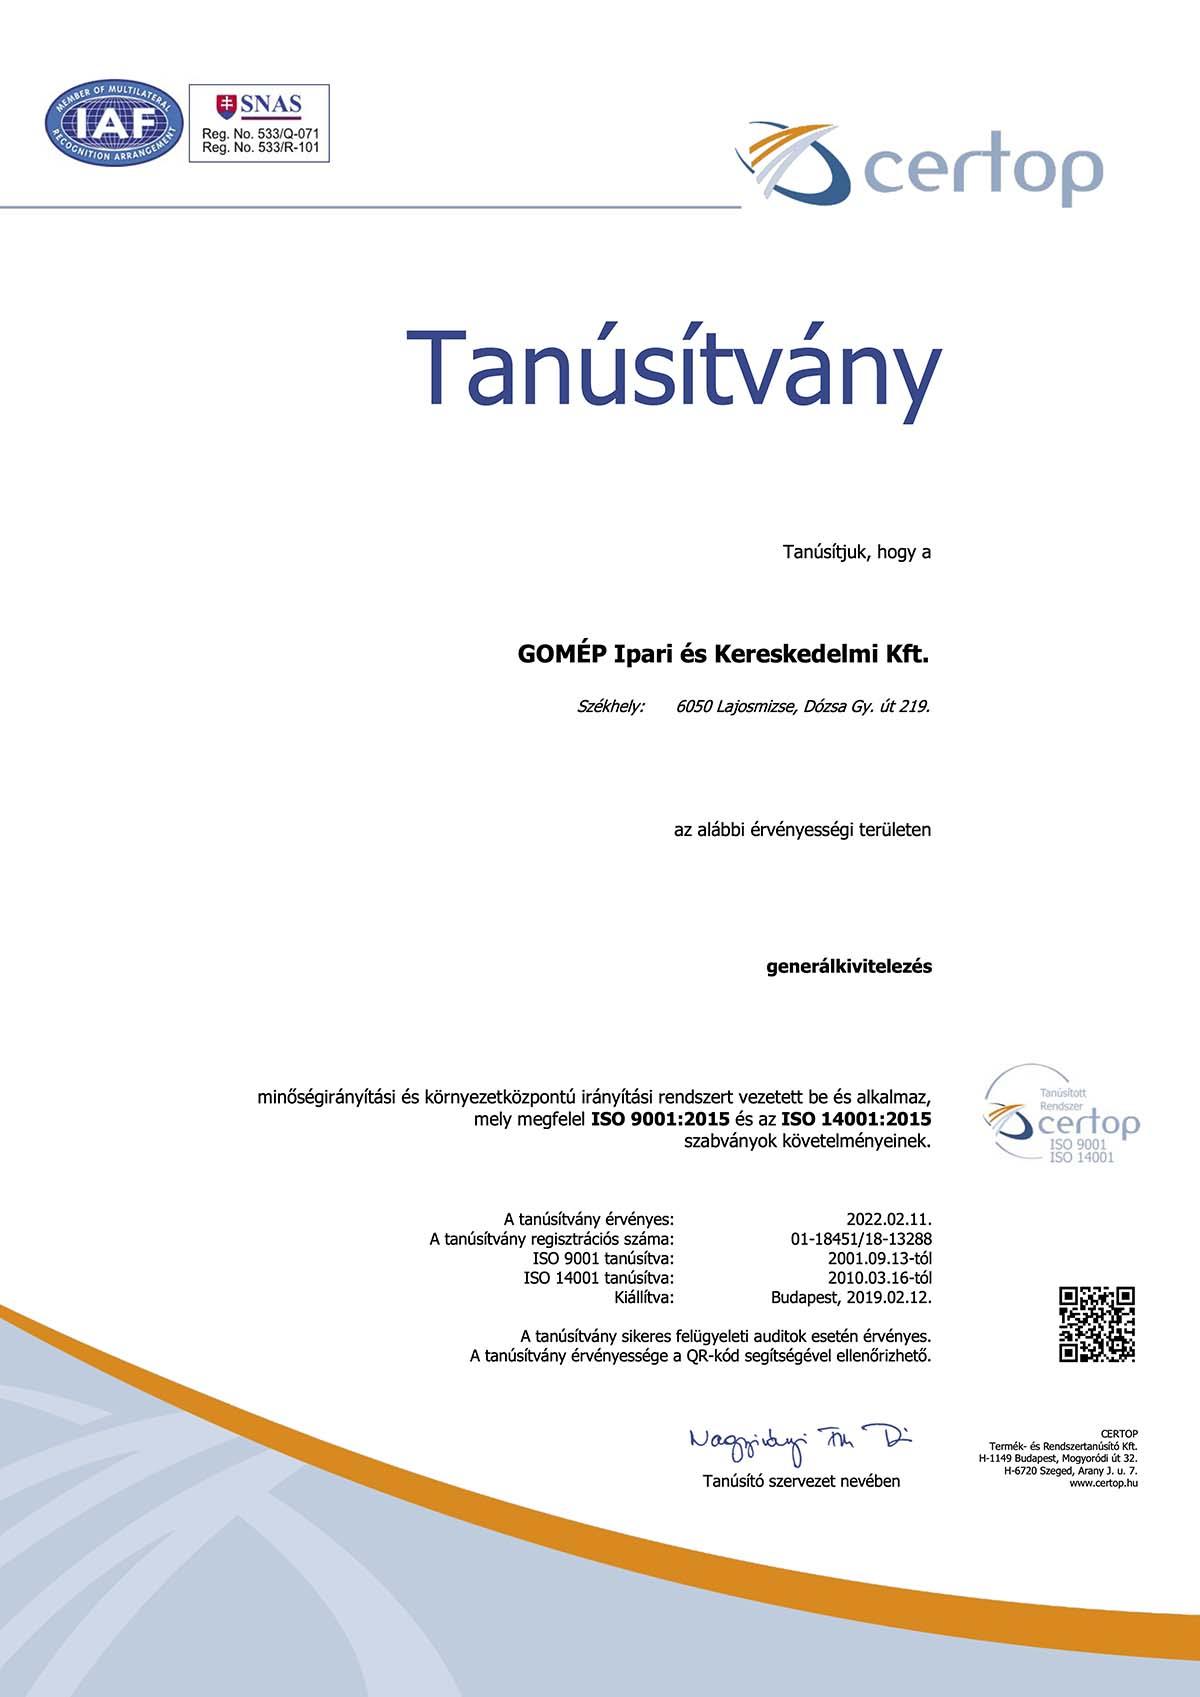 tanúsítvány HU18451-18 MIR_KIR magyar